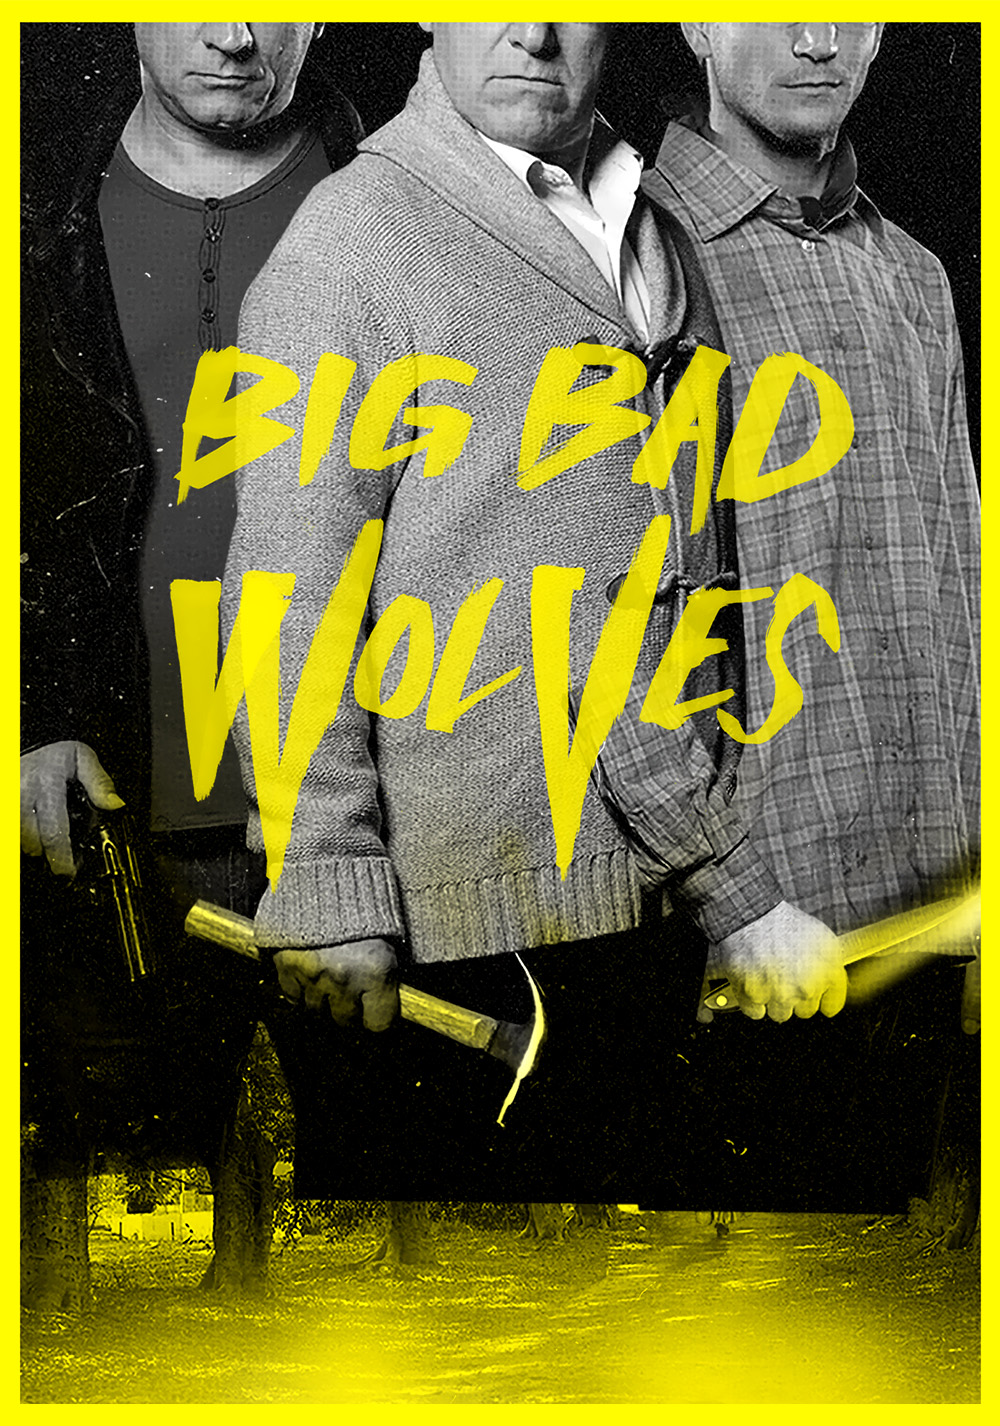 big bad wolf movie poster - photo #6